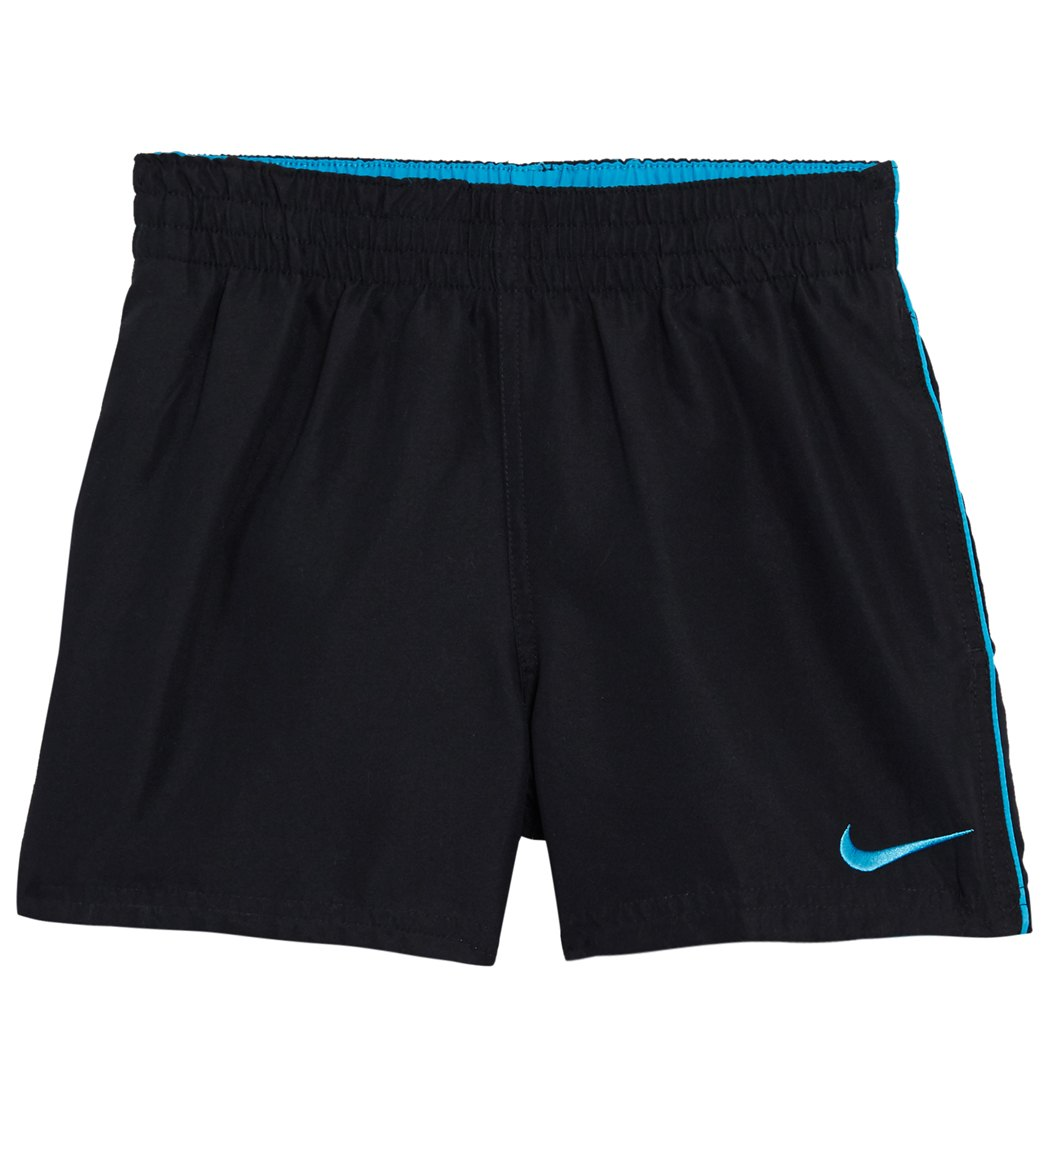 38d604d760 Nike Boys' 13